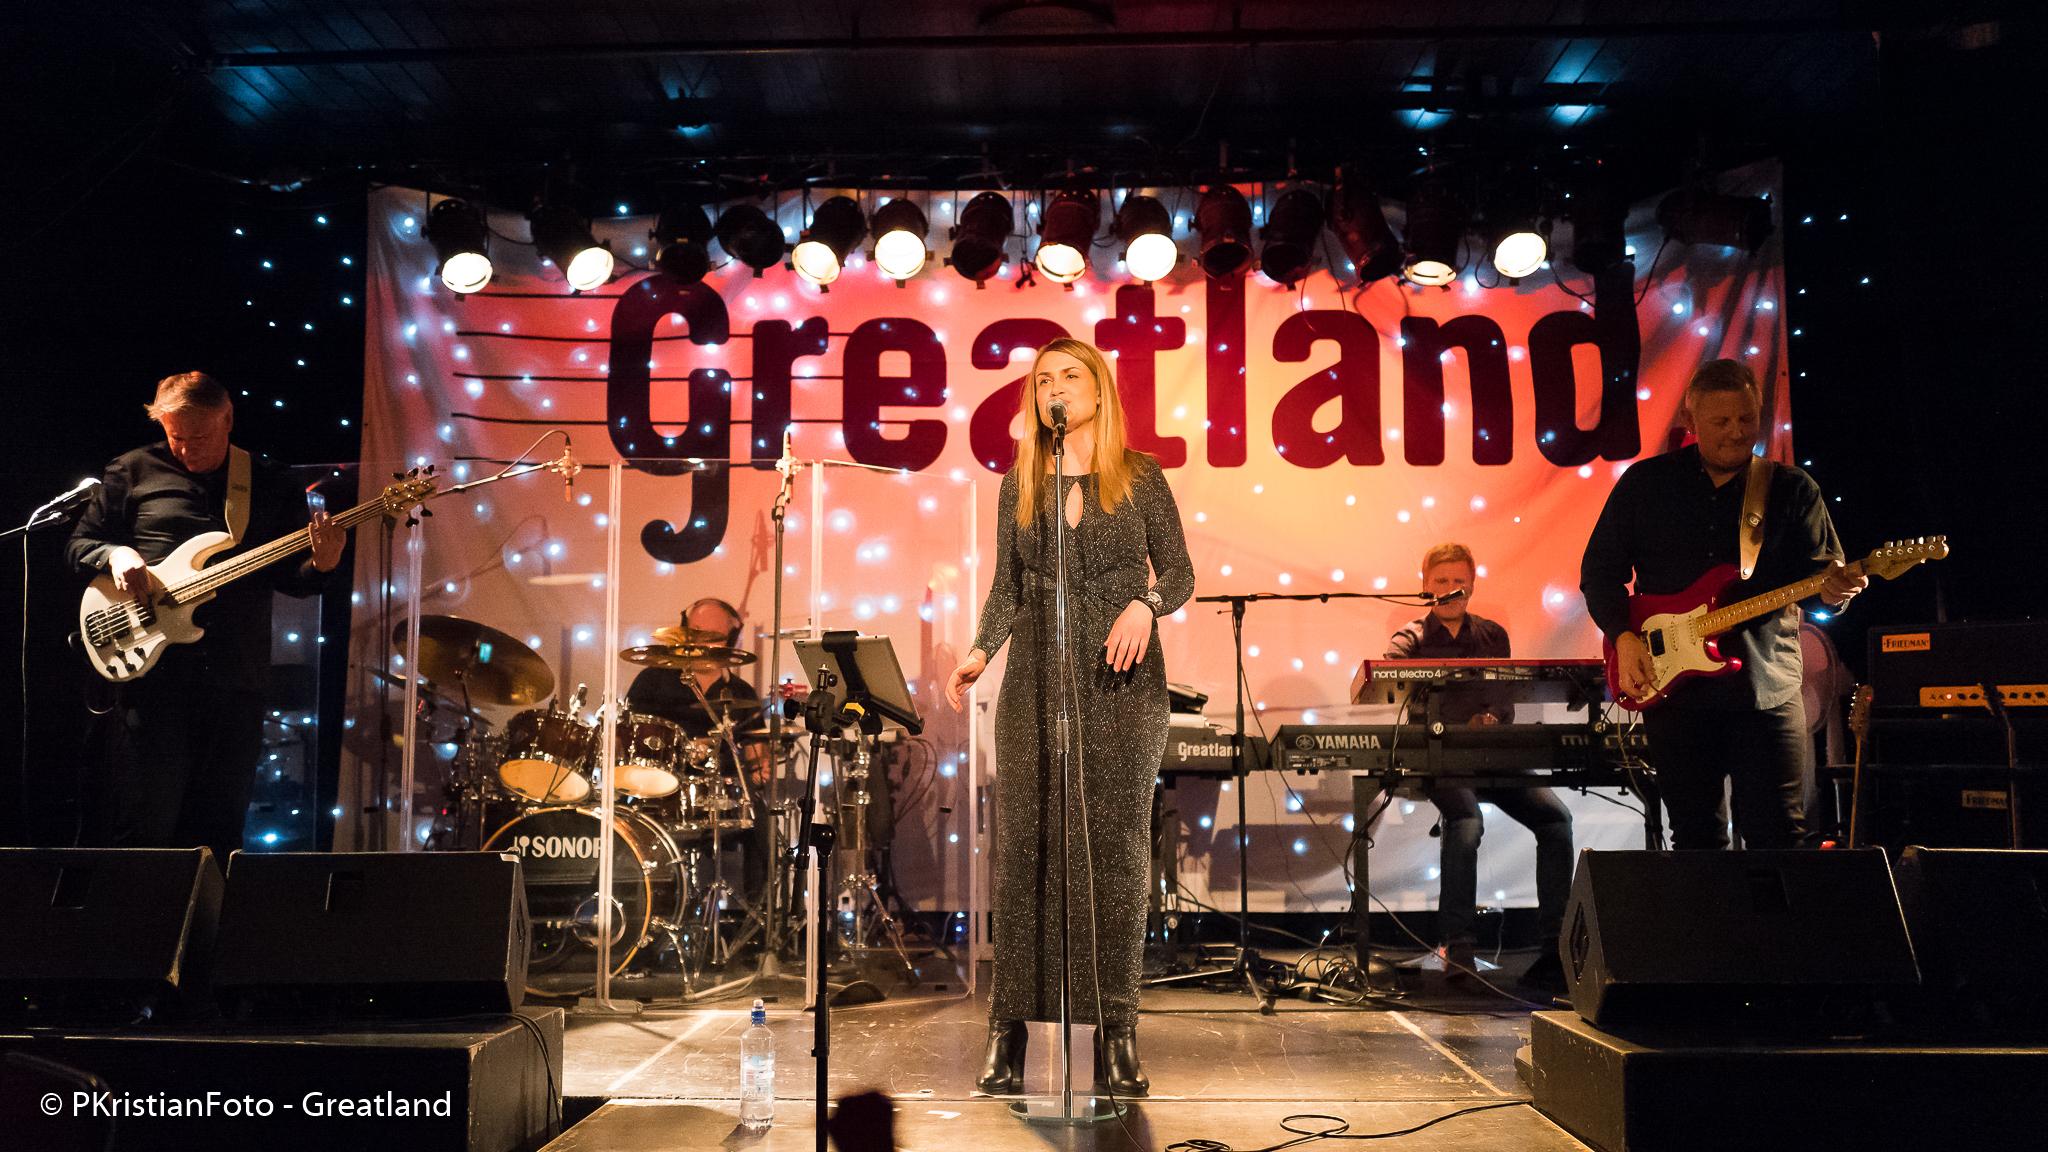 2016.12.03 Greatland - Gamlebyen Kulturhus - L1050022 - 16x9